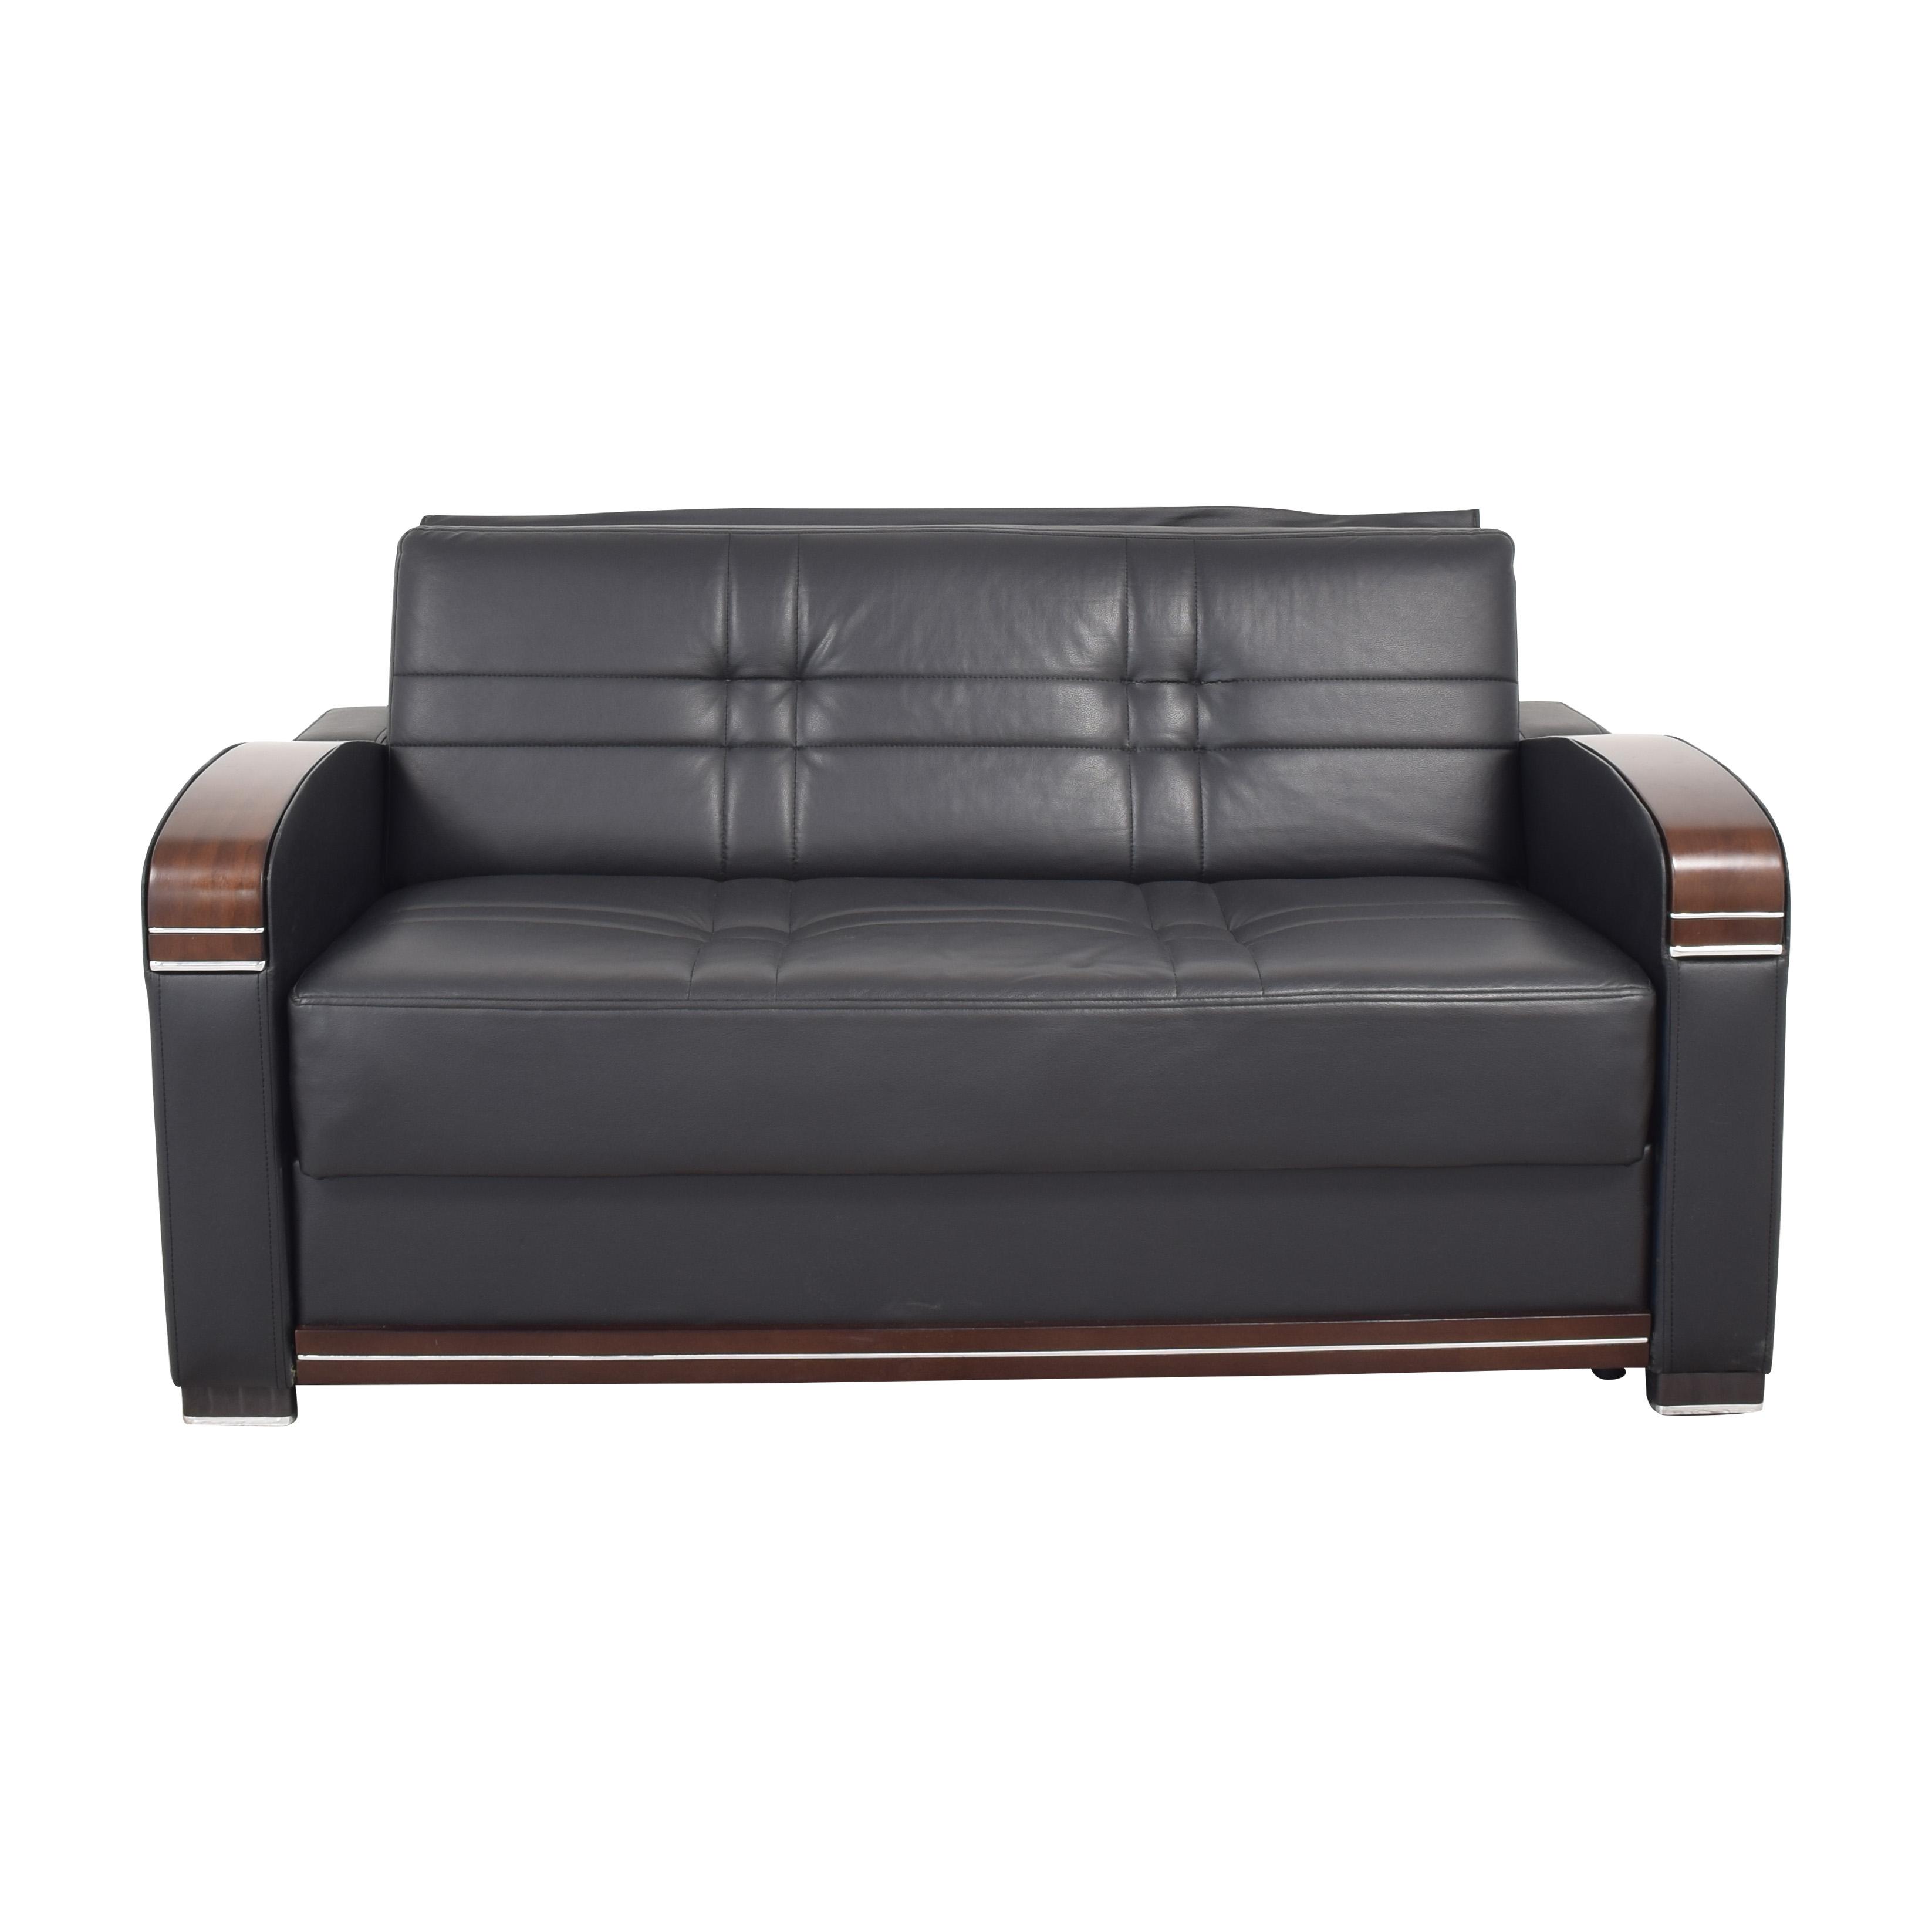 Sofaitalia Black Faux Leather Full Sleeper Sofa / Sofas